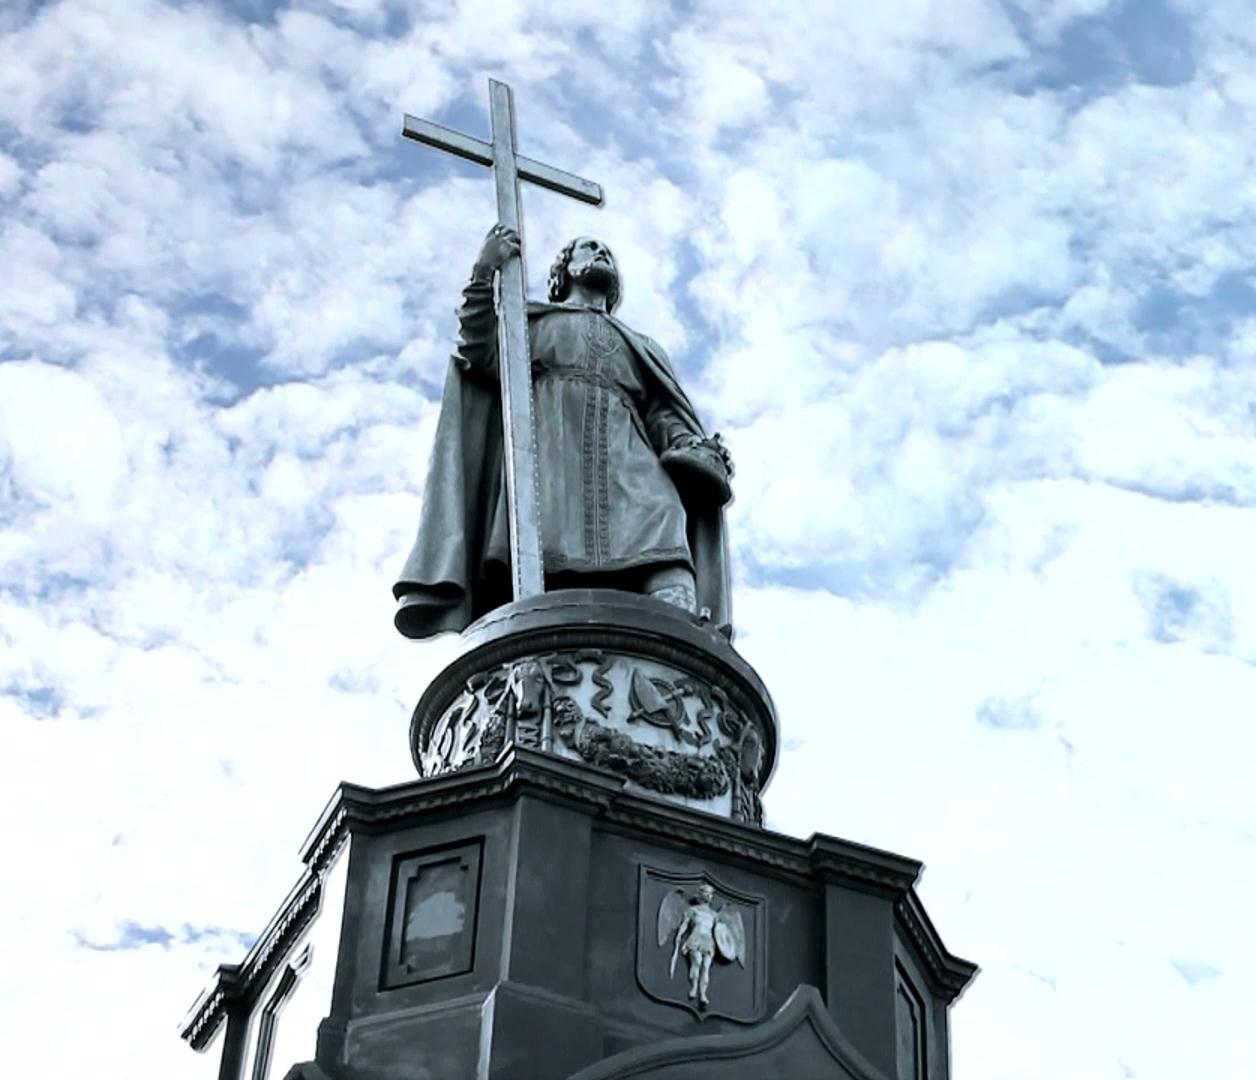 Пам'ятник князю Володимиру в Києві. 1850-1853.